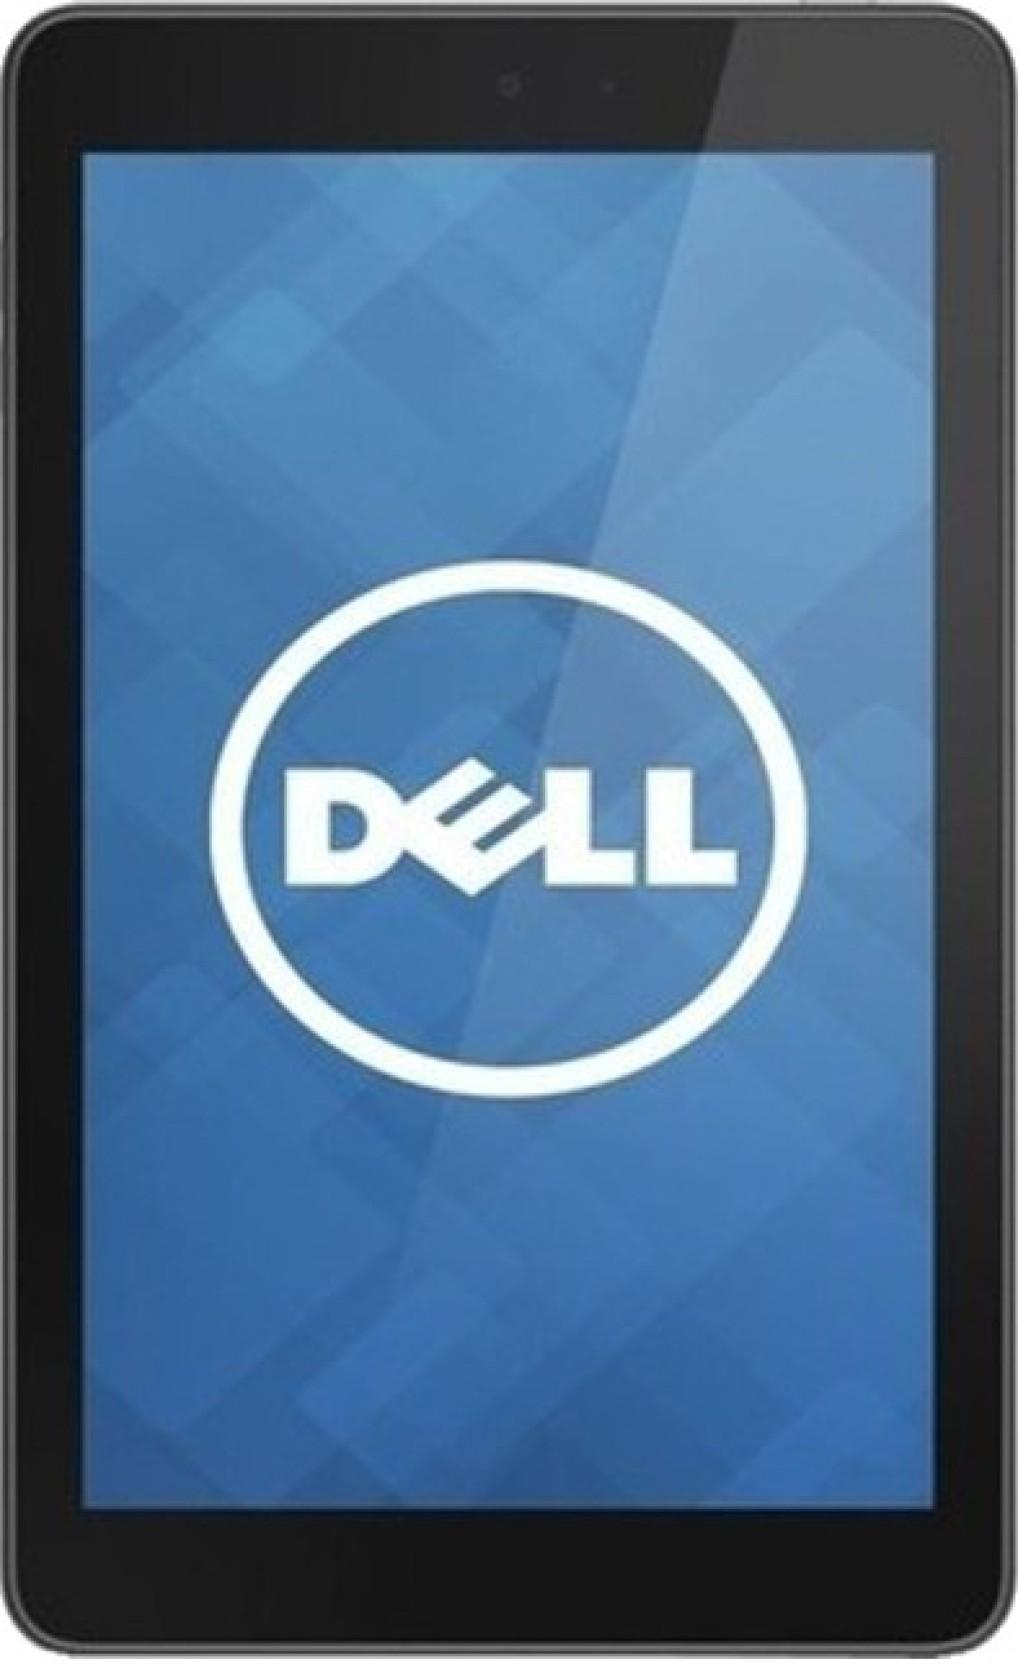 Dell Venue 7 3741 Tablet Price In India Buy Asus Eee Pc P701 Block Diagram Home